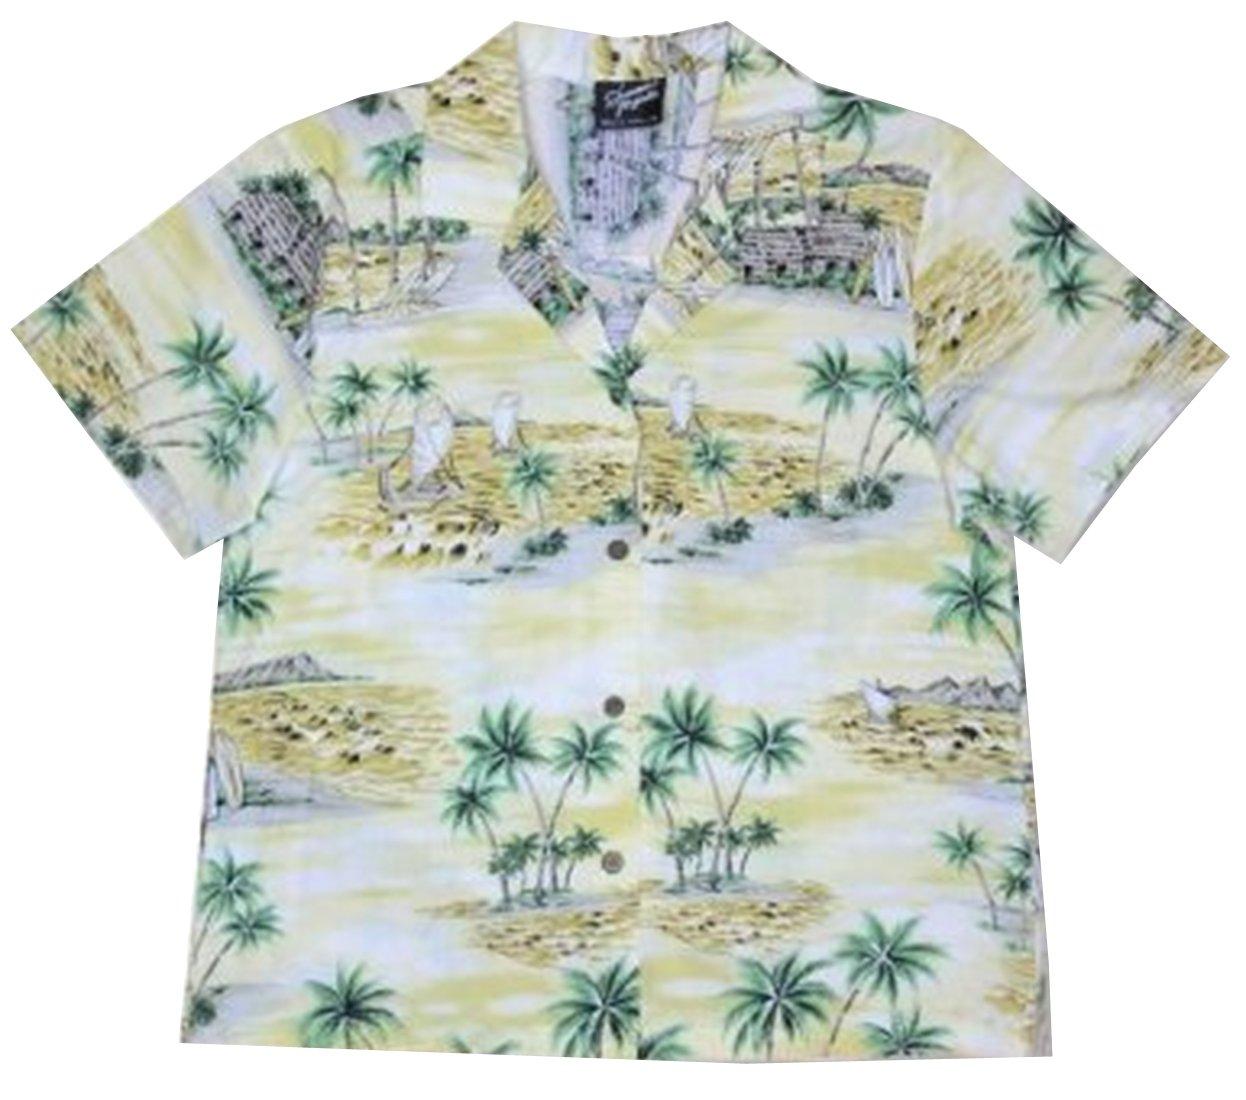 RJC Women Polynesian Island Camp Shirt in Yellow - XXL by RJC Women